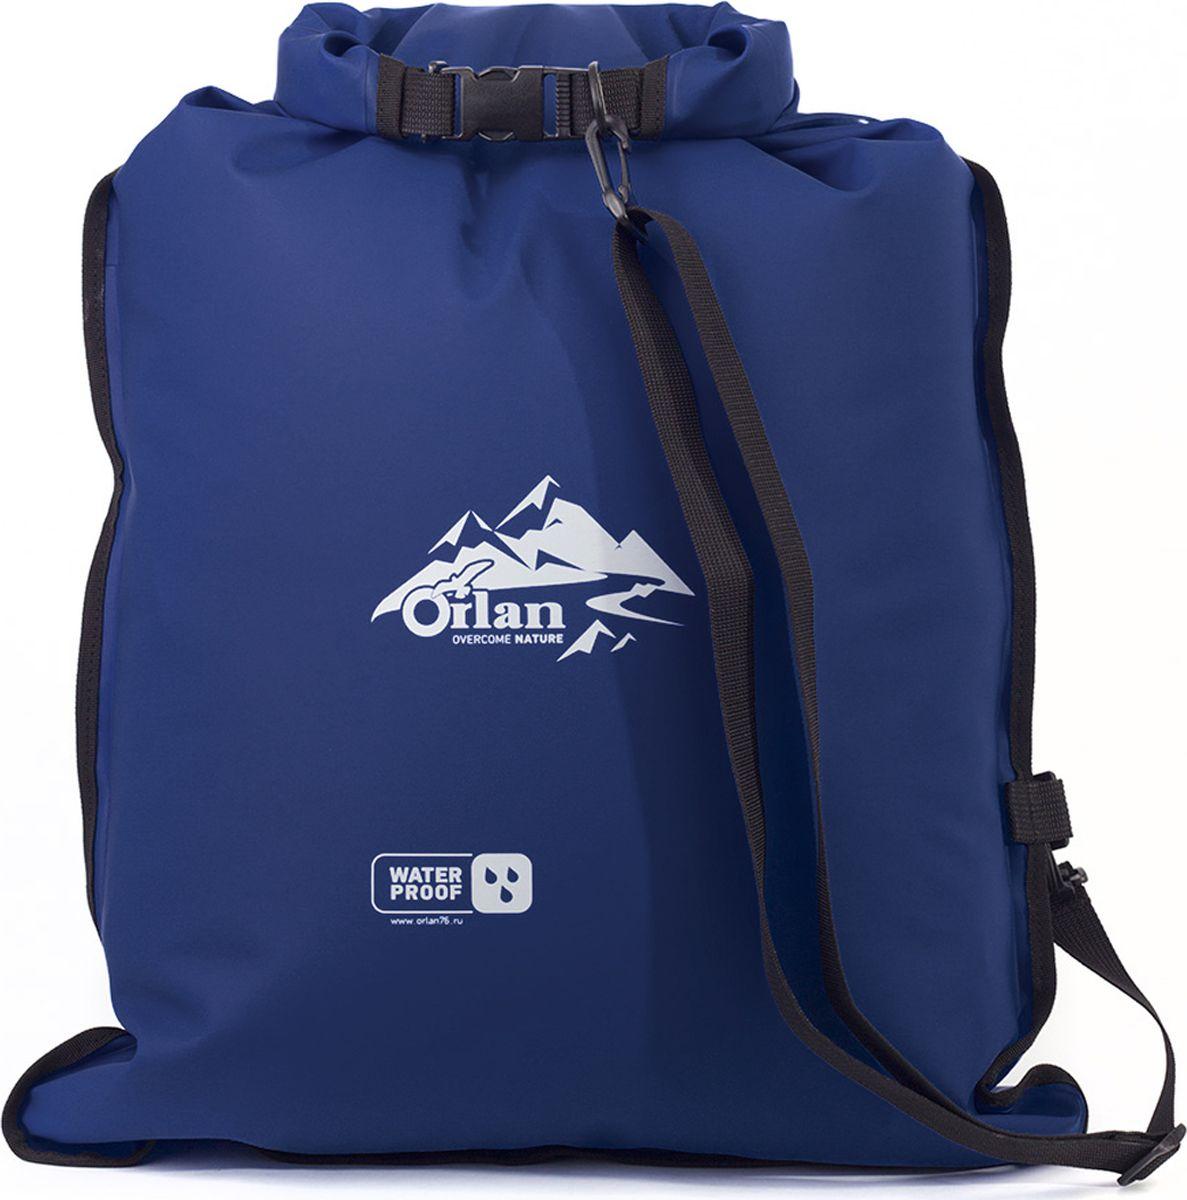 Гермомешок Orlan Компакт, цвет: синий, 45 л гермомешок orlan компакт цвет темно синий 10 л